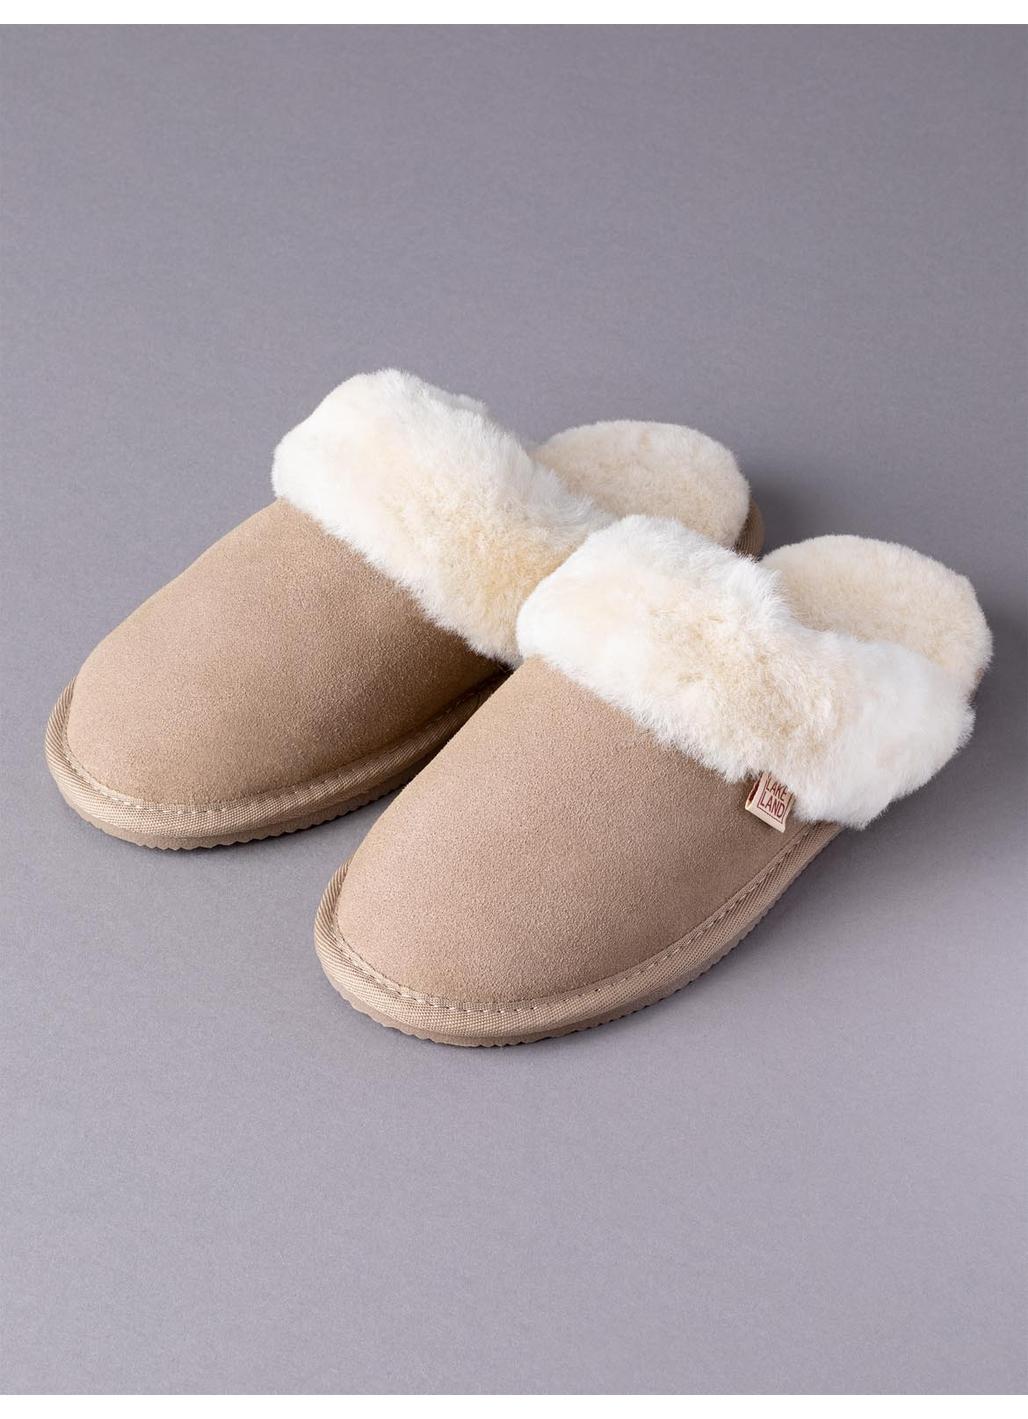 Ladies' Sheepskin Slider Slippers in Stone